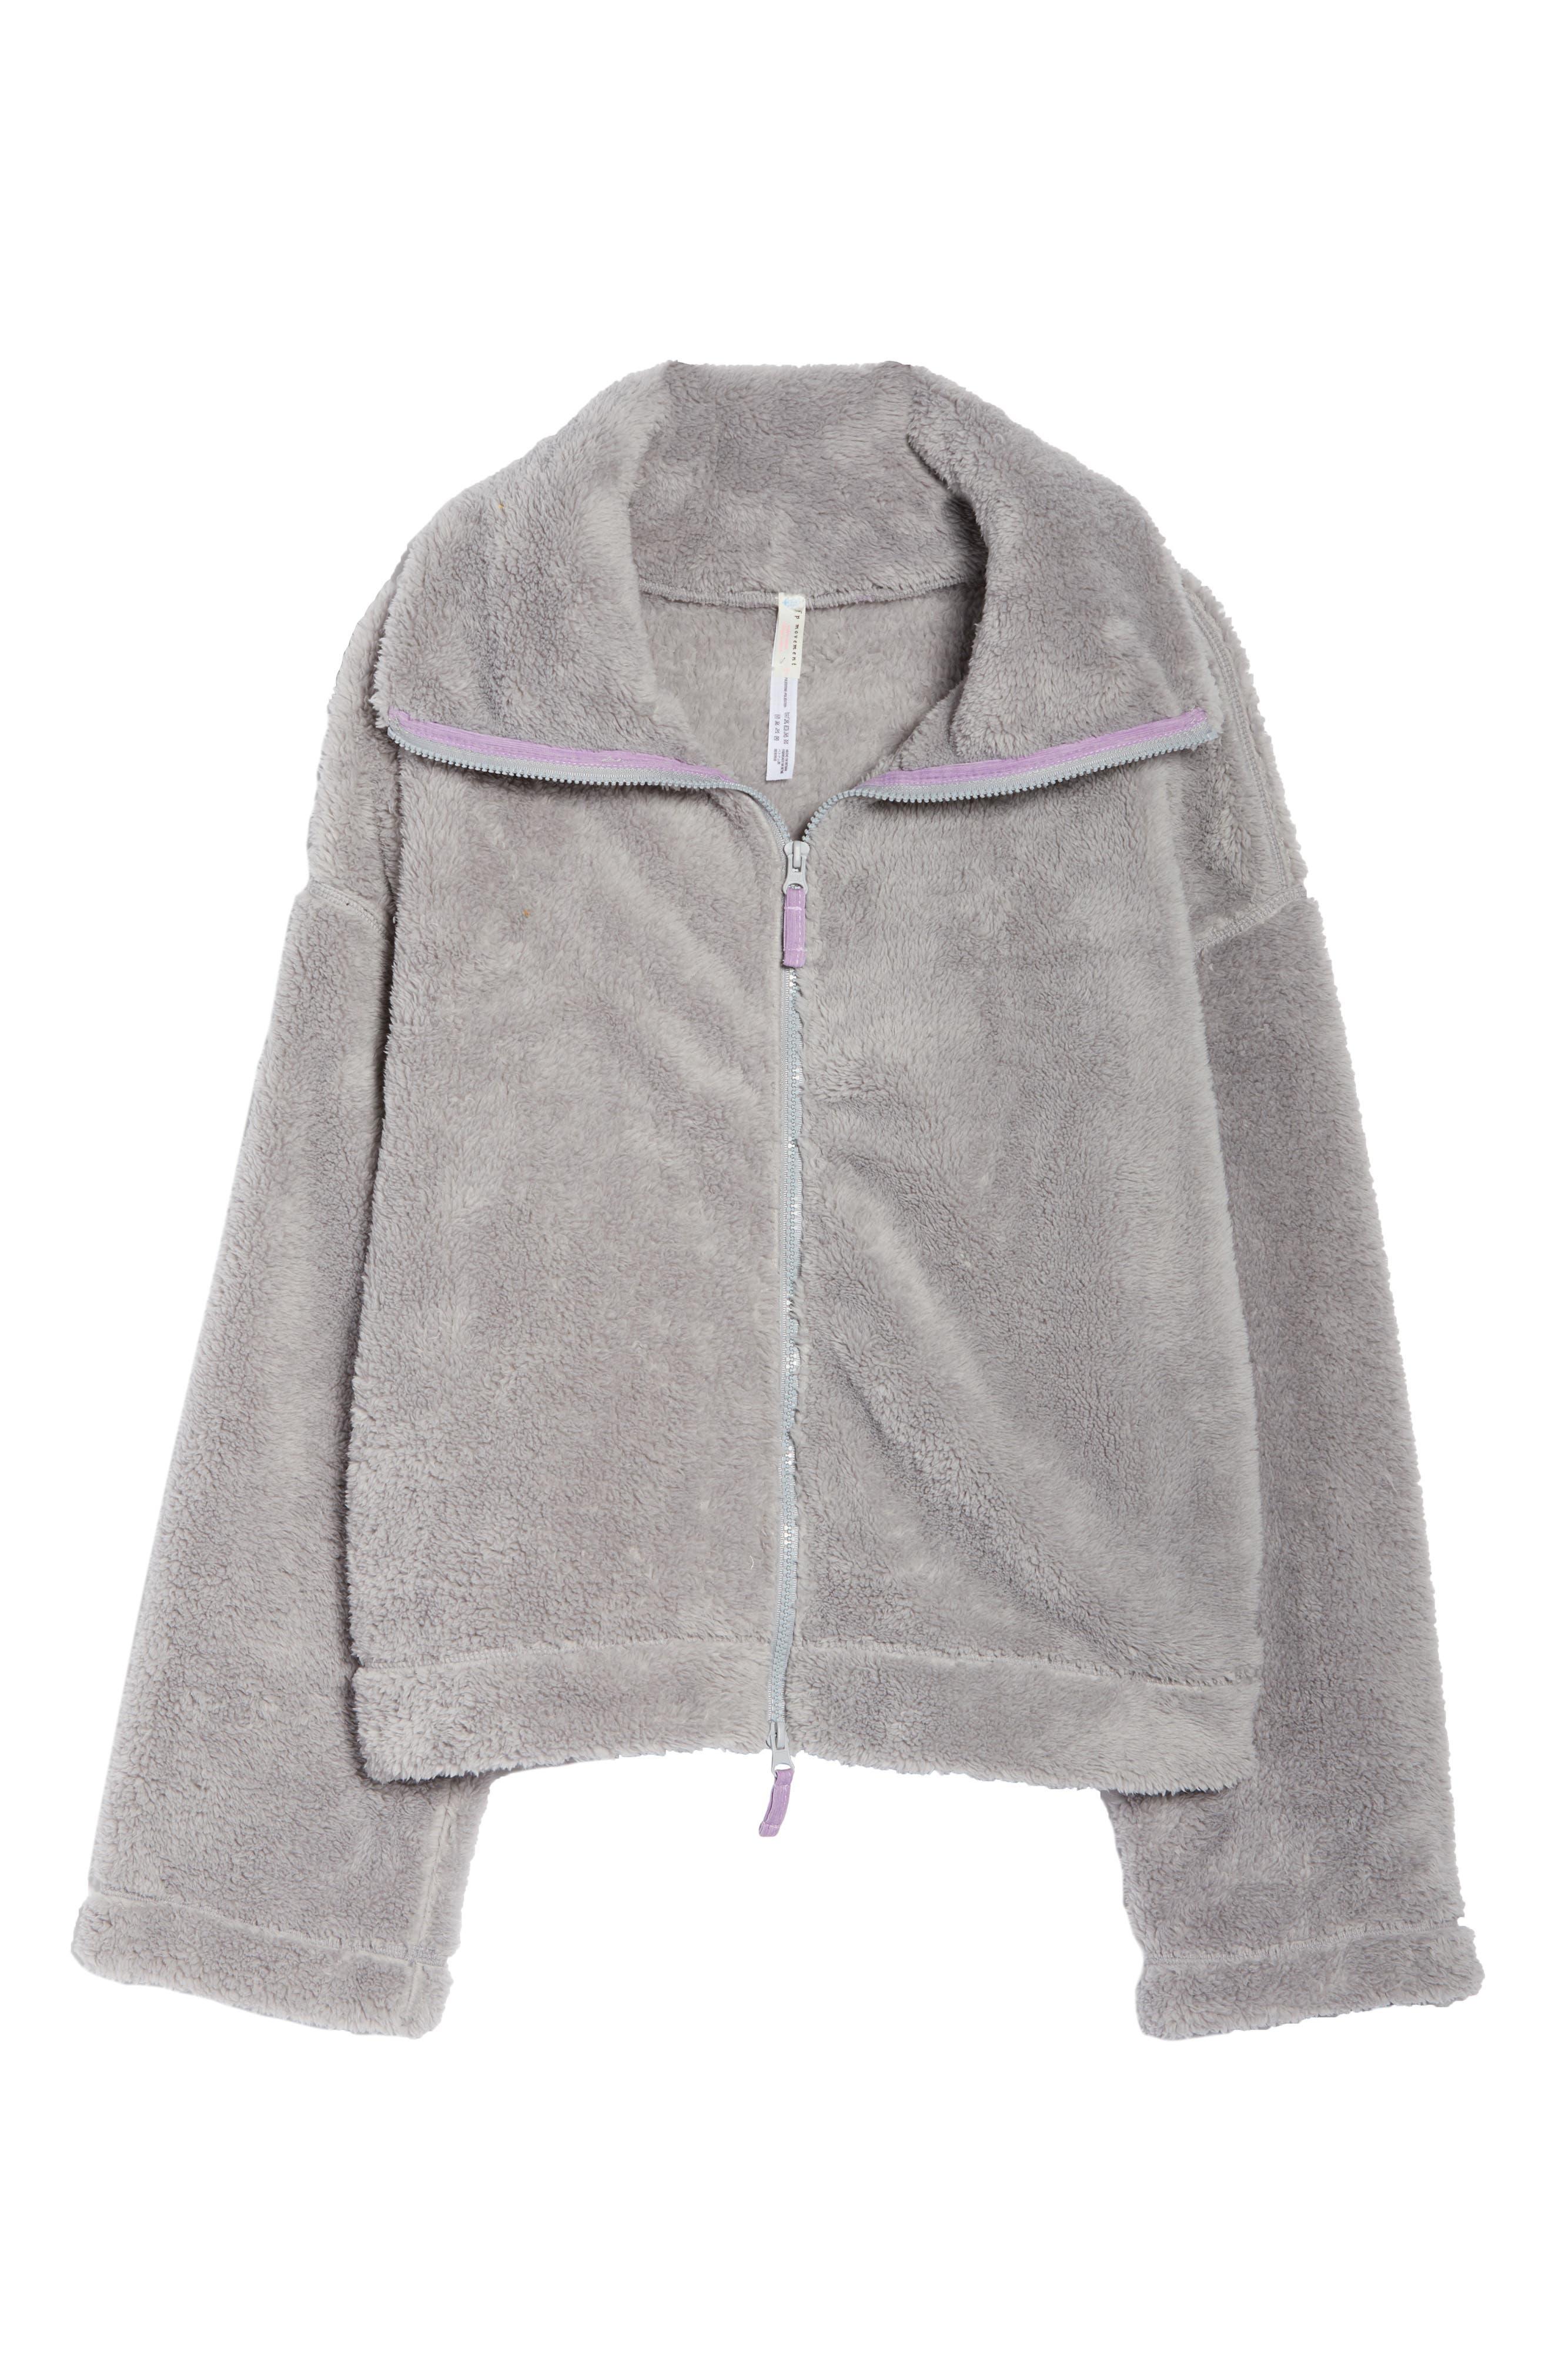 Dazed Fleece Jacket,                             Alternate thumbnail 7, color,                             GREY